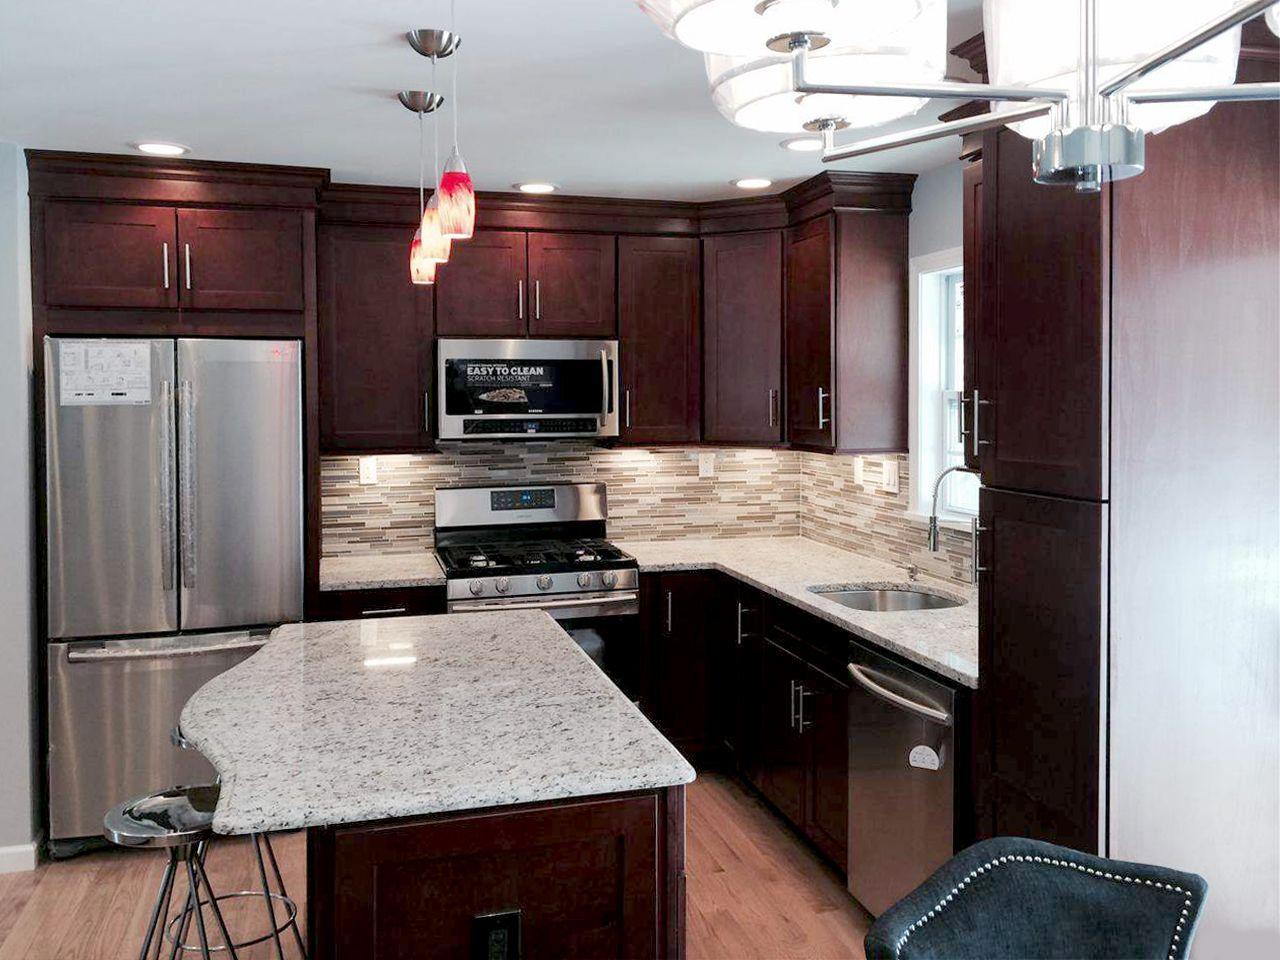 Entire Kitchen Remodel Designed And Purchased At Bargain Outlet's Alluring Kitchen Model Design Inspiration Design